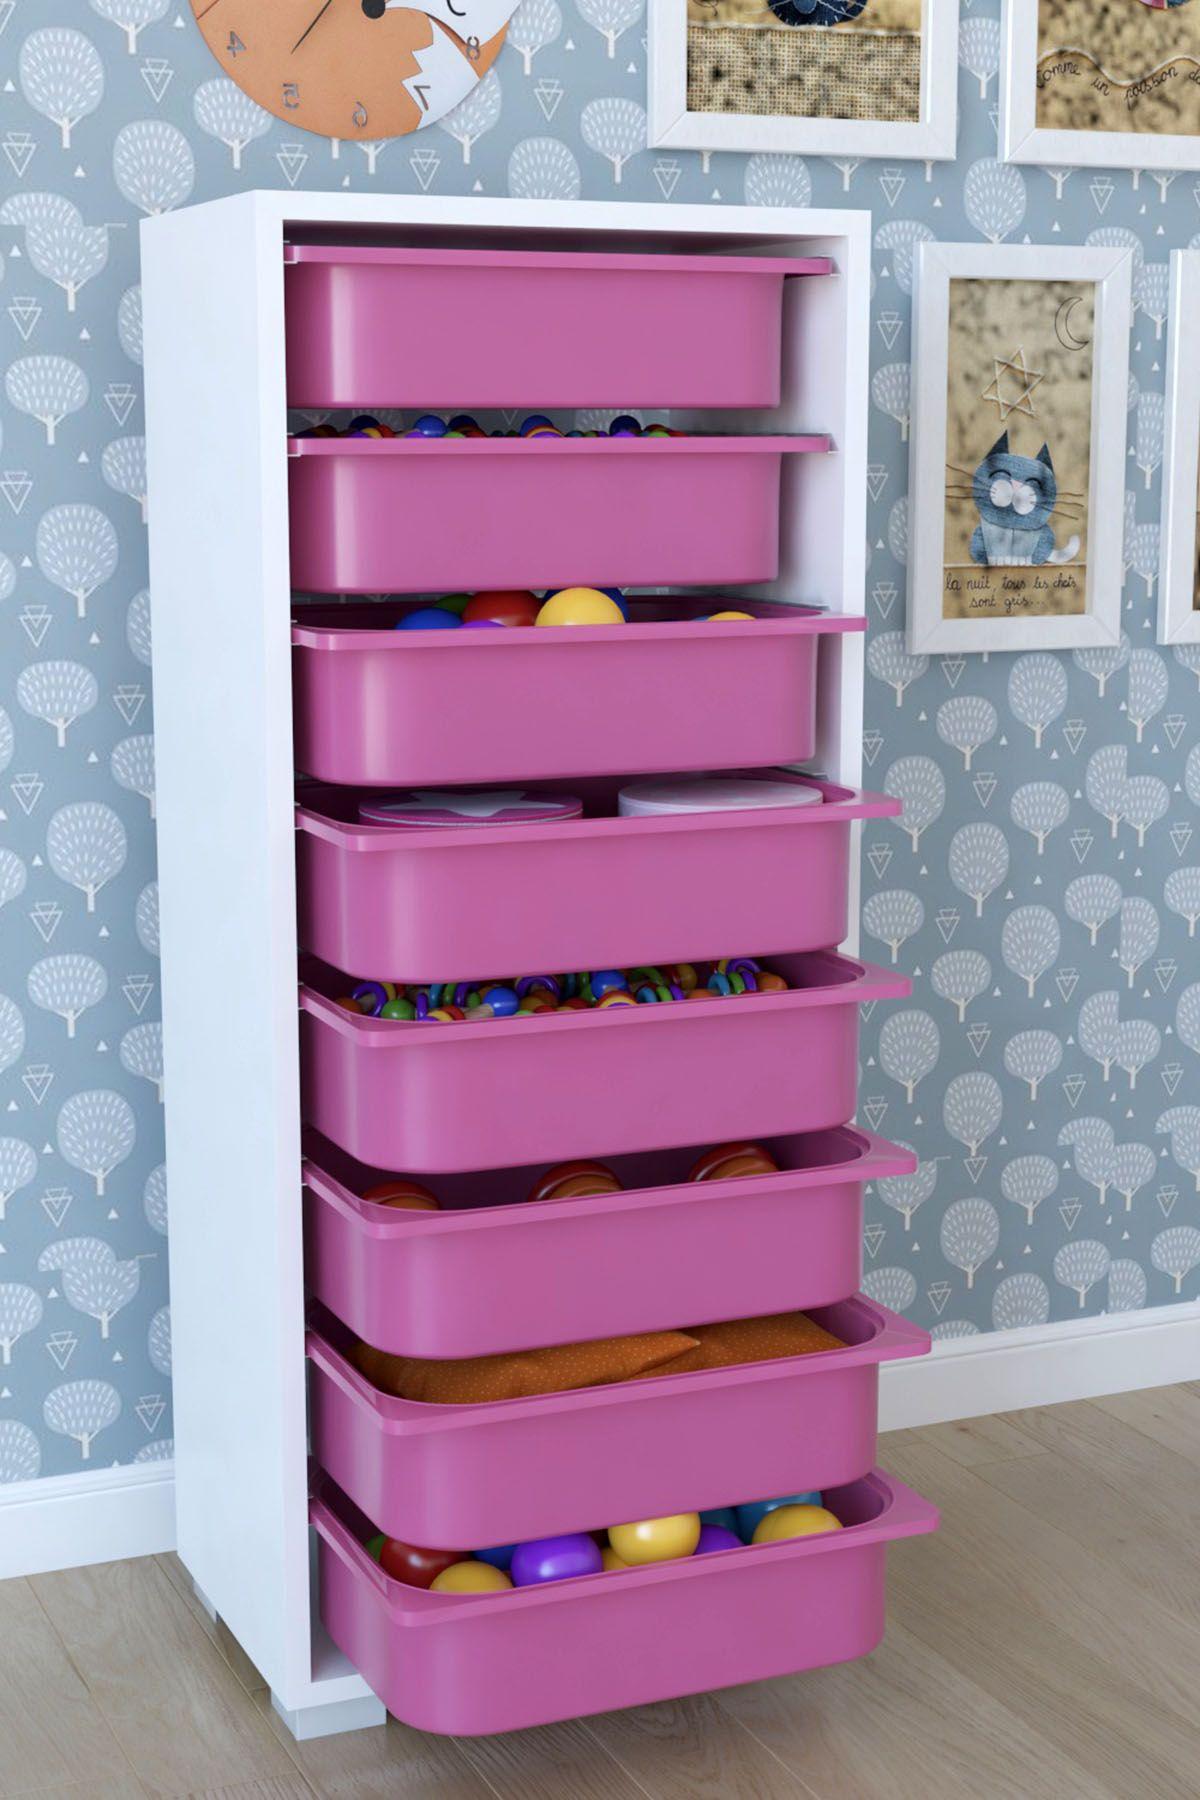 Dulap cu 8 sertare, Steli Homs, 45 x 30 x 109,5 cm alb-roz, palppe